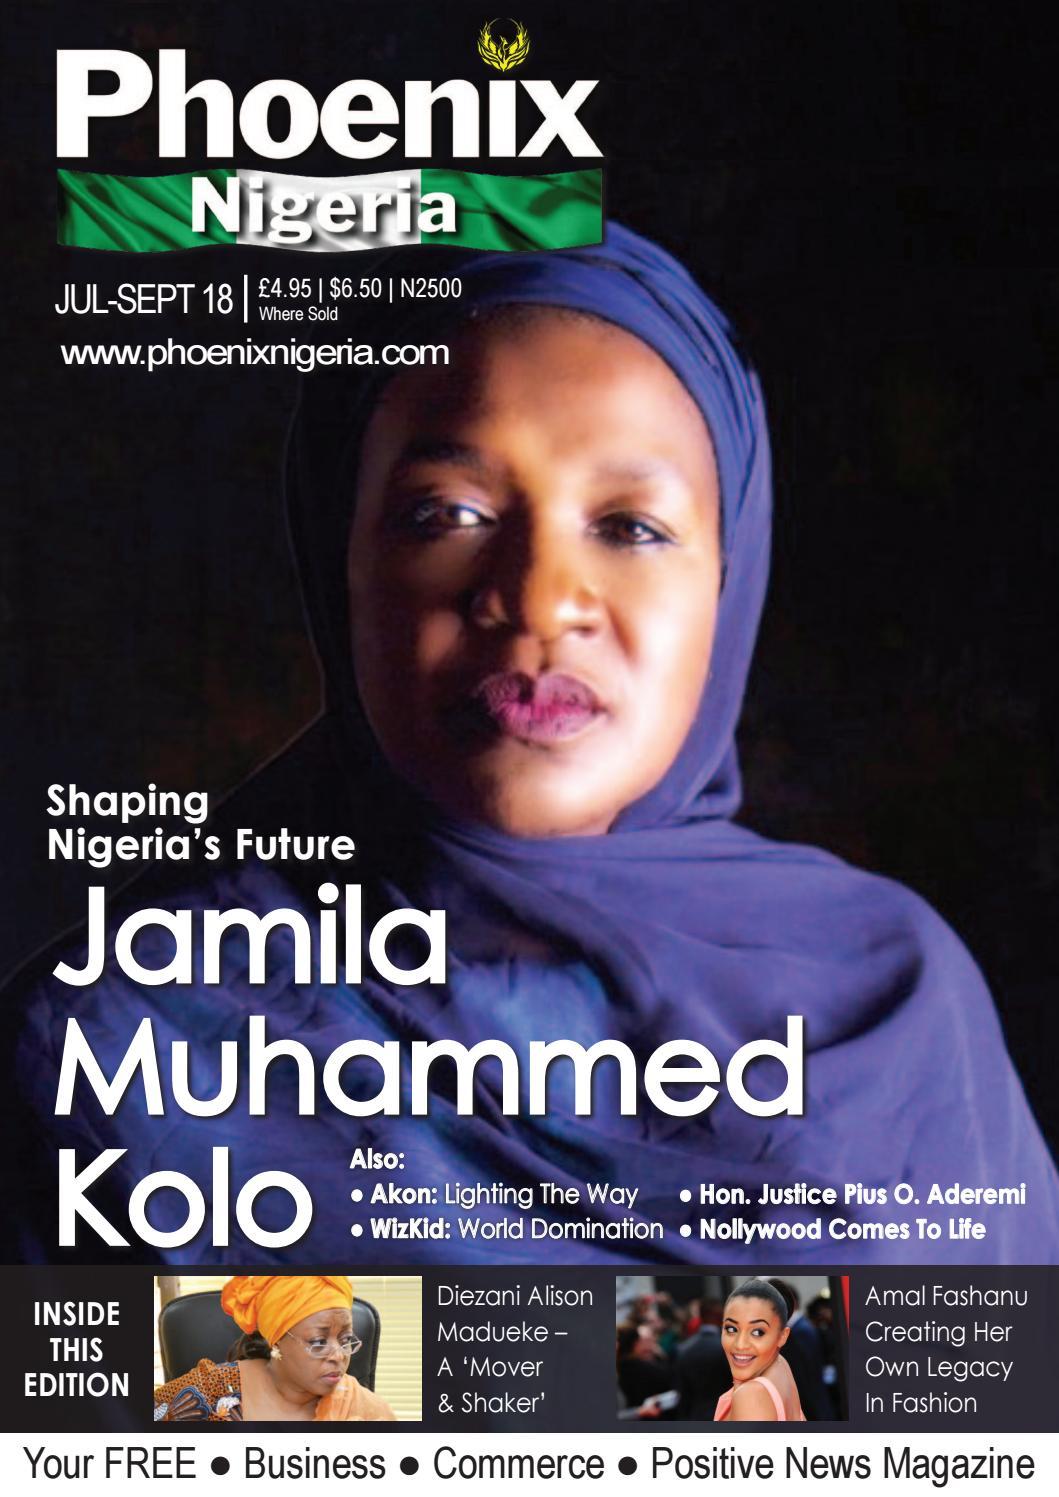 Phoenix Nigeria - July-September 2018 by The Phoenix